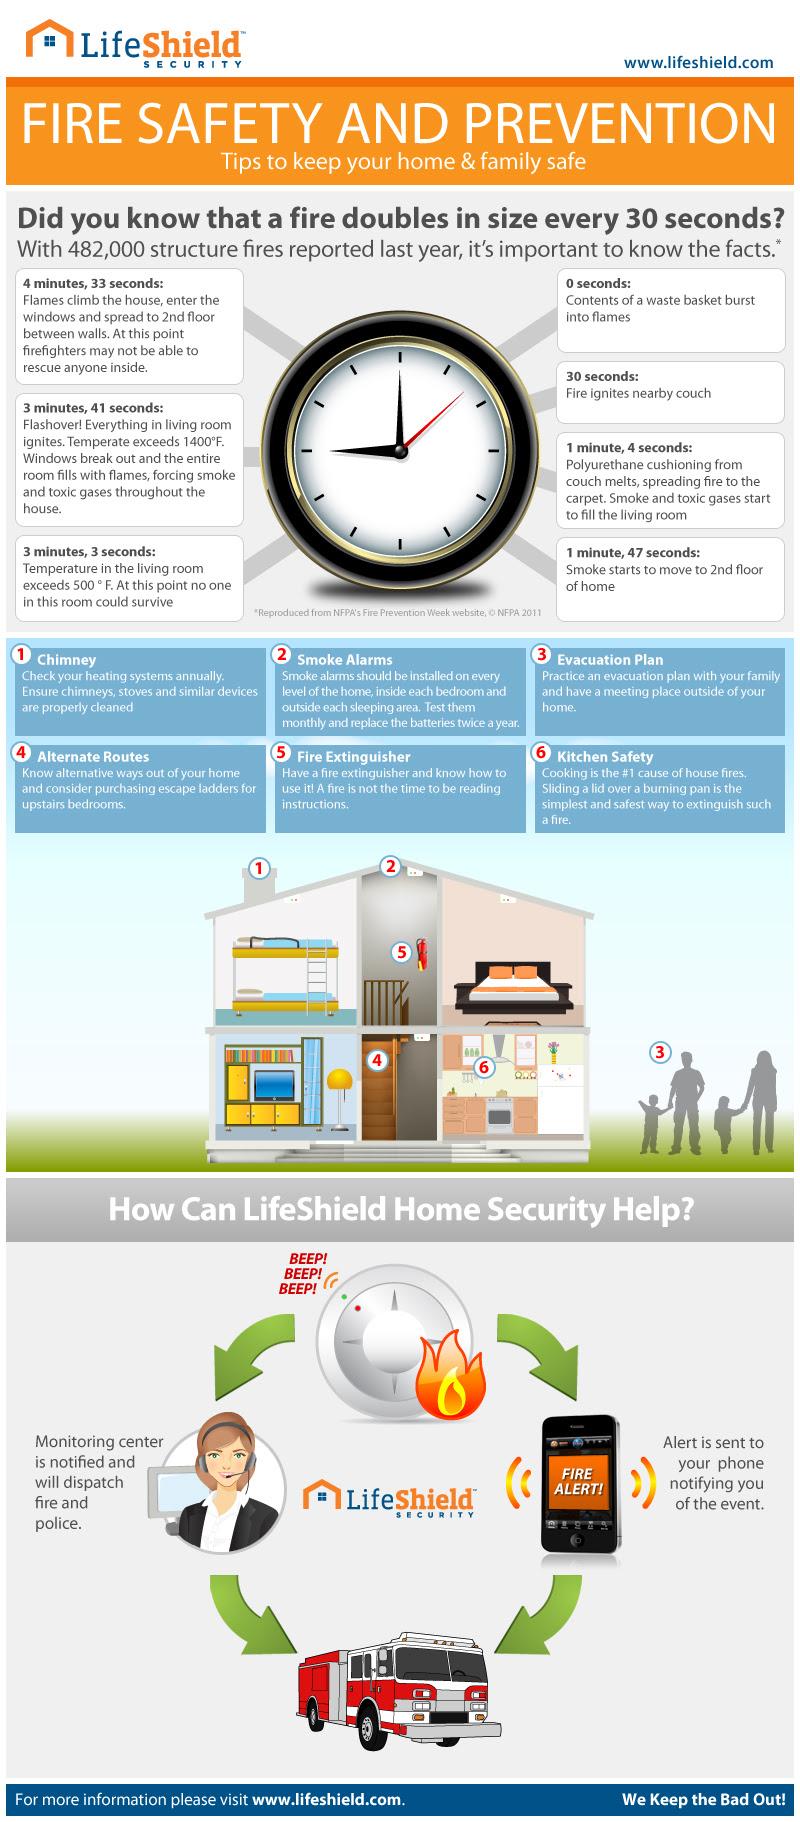 LifeShield Home Security burglar fire alarm safety